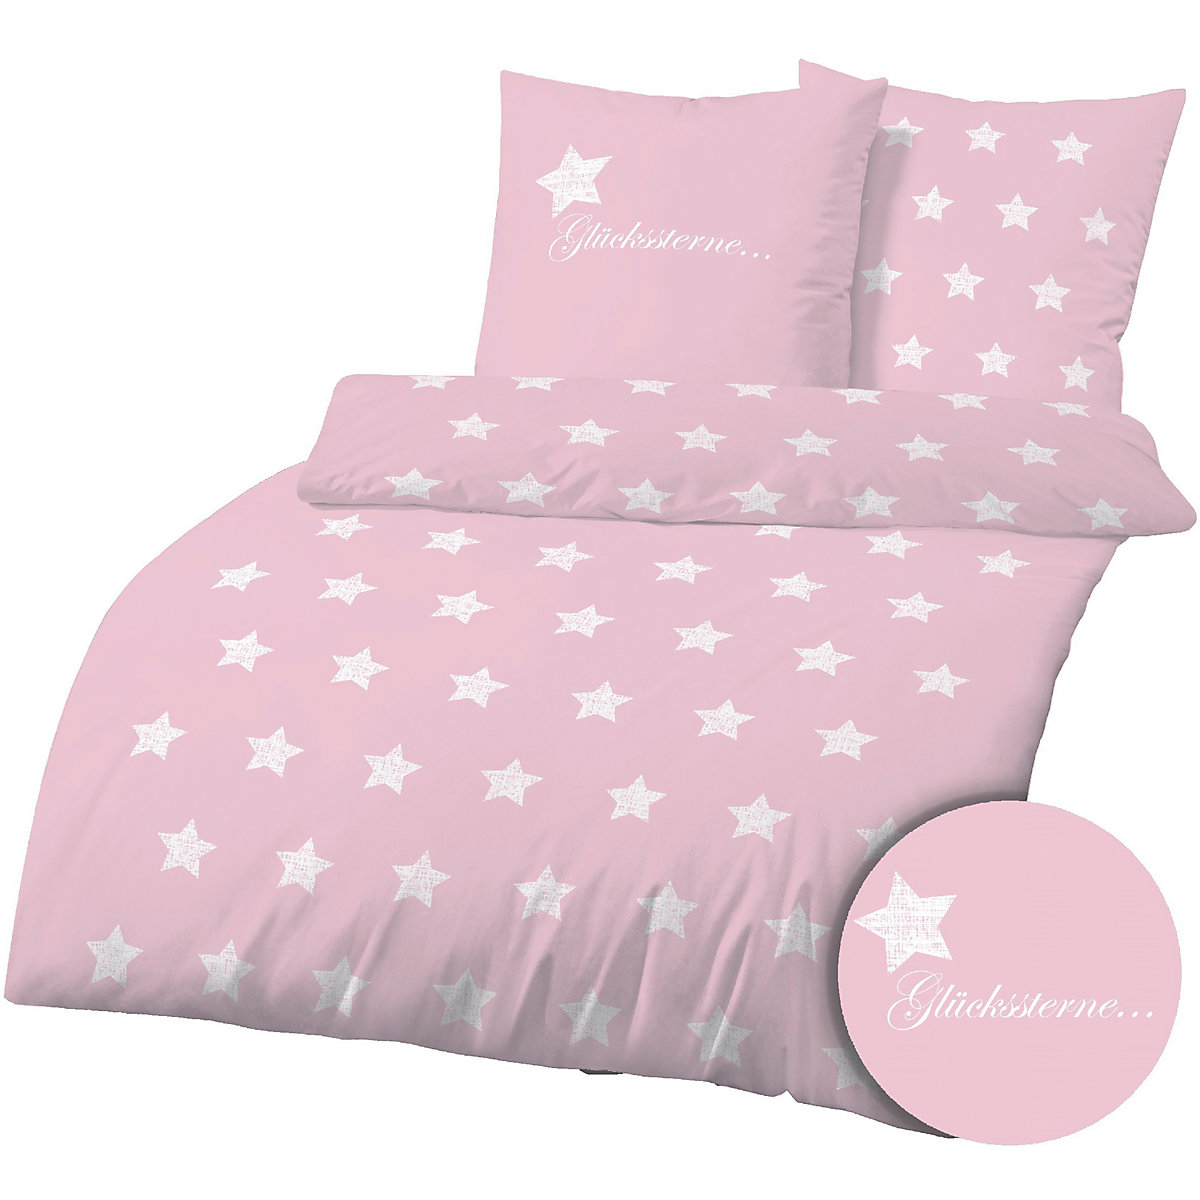 biber bettw sche 135x200 80x80 cm rosa yomonda. Black Bedroom Furniture Sets. Home Design Ideas